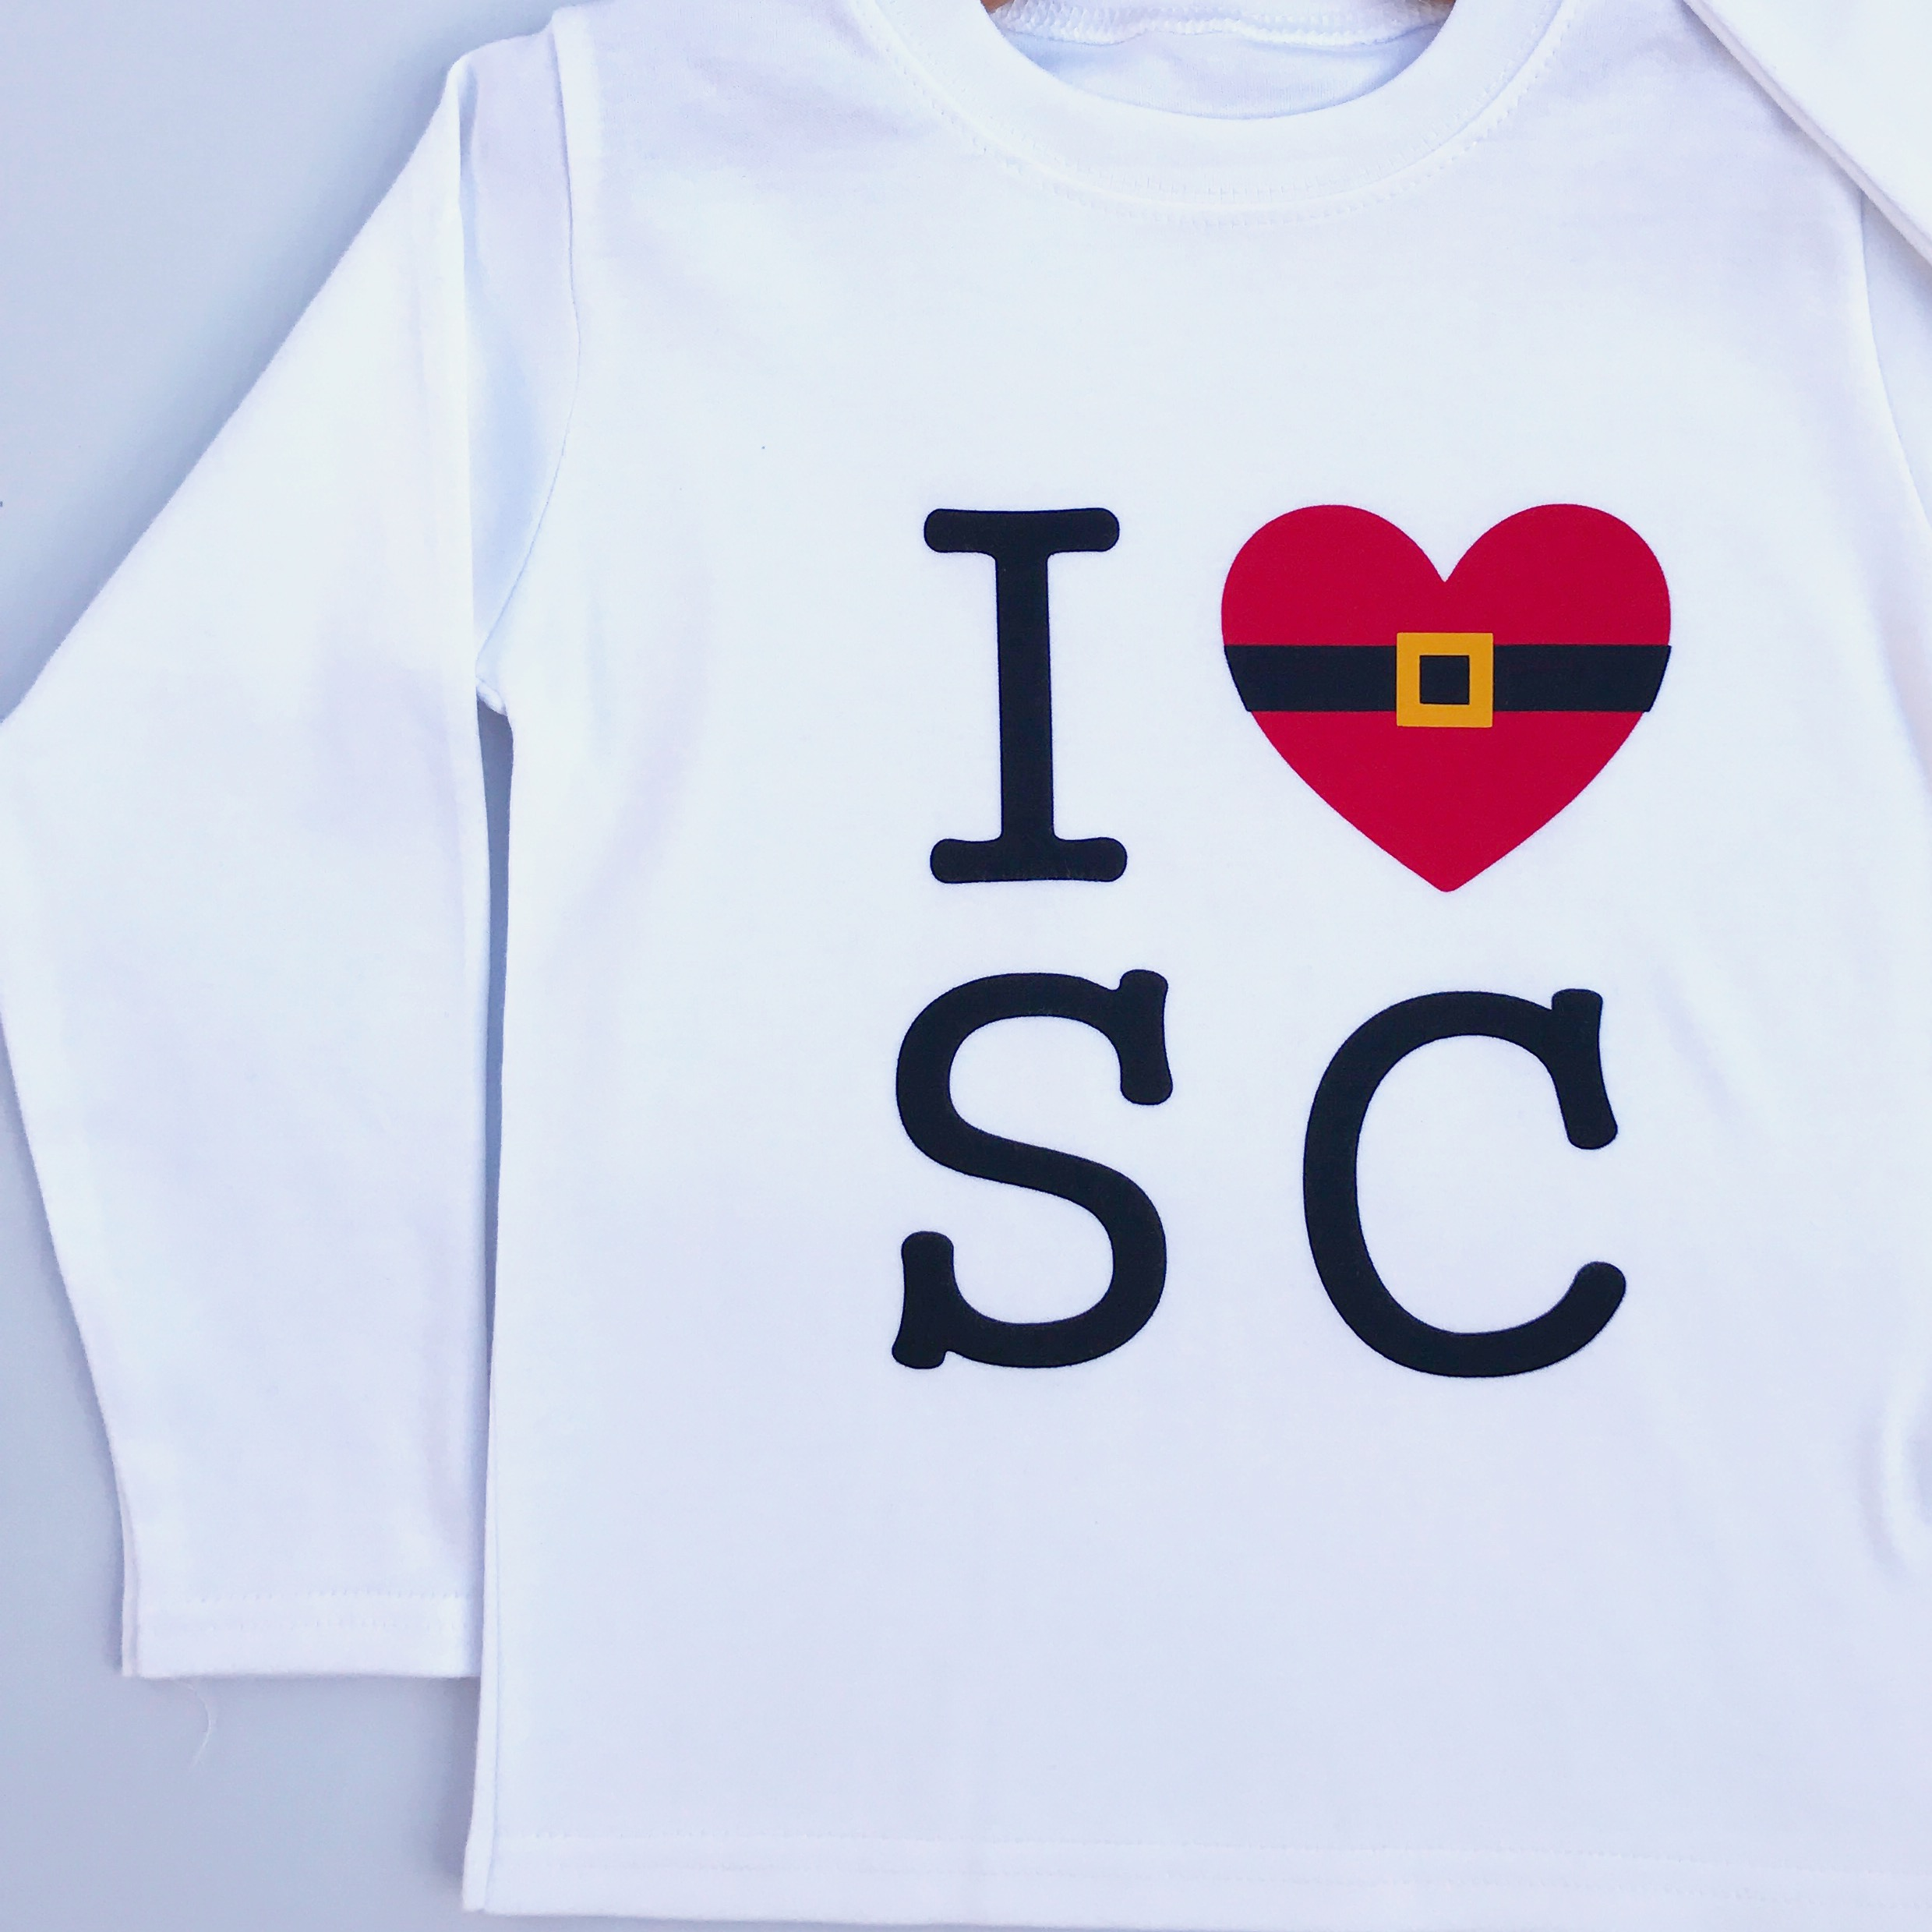 Iheart Christmas.I Heart Santa Claus Christmas T Shirt